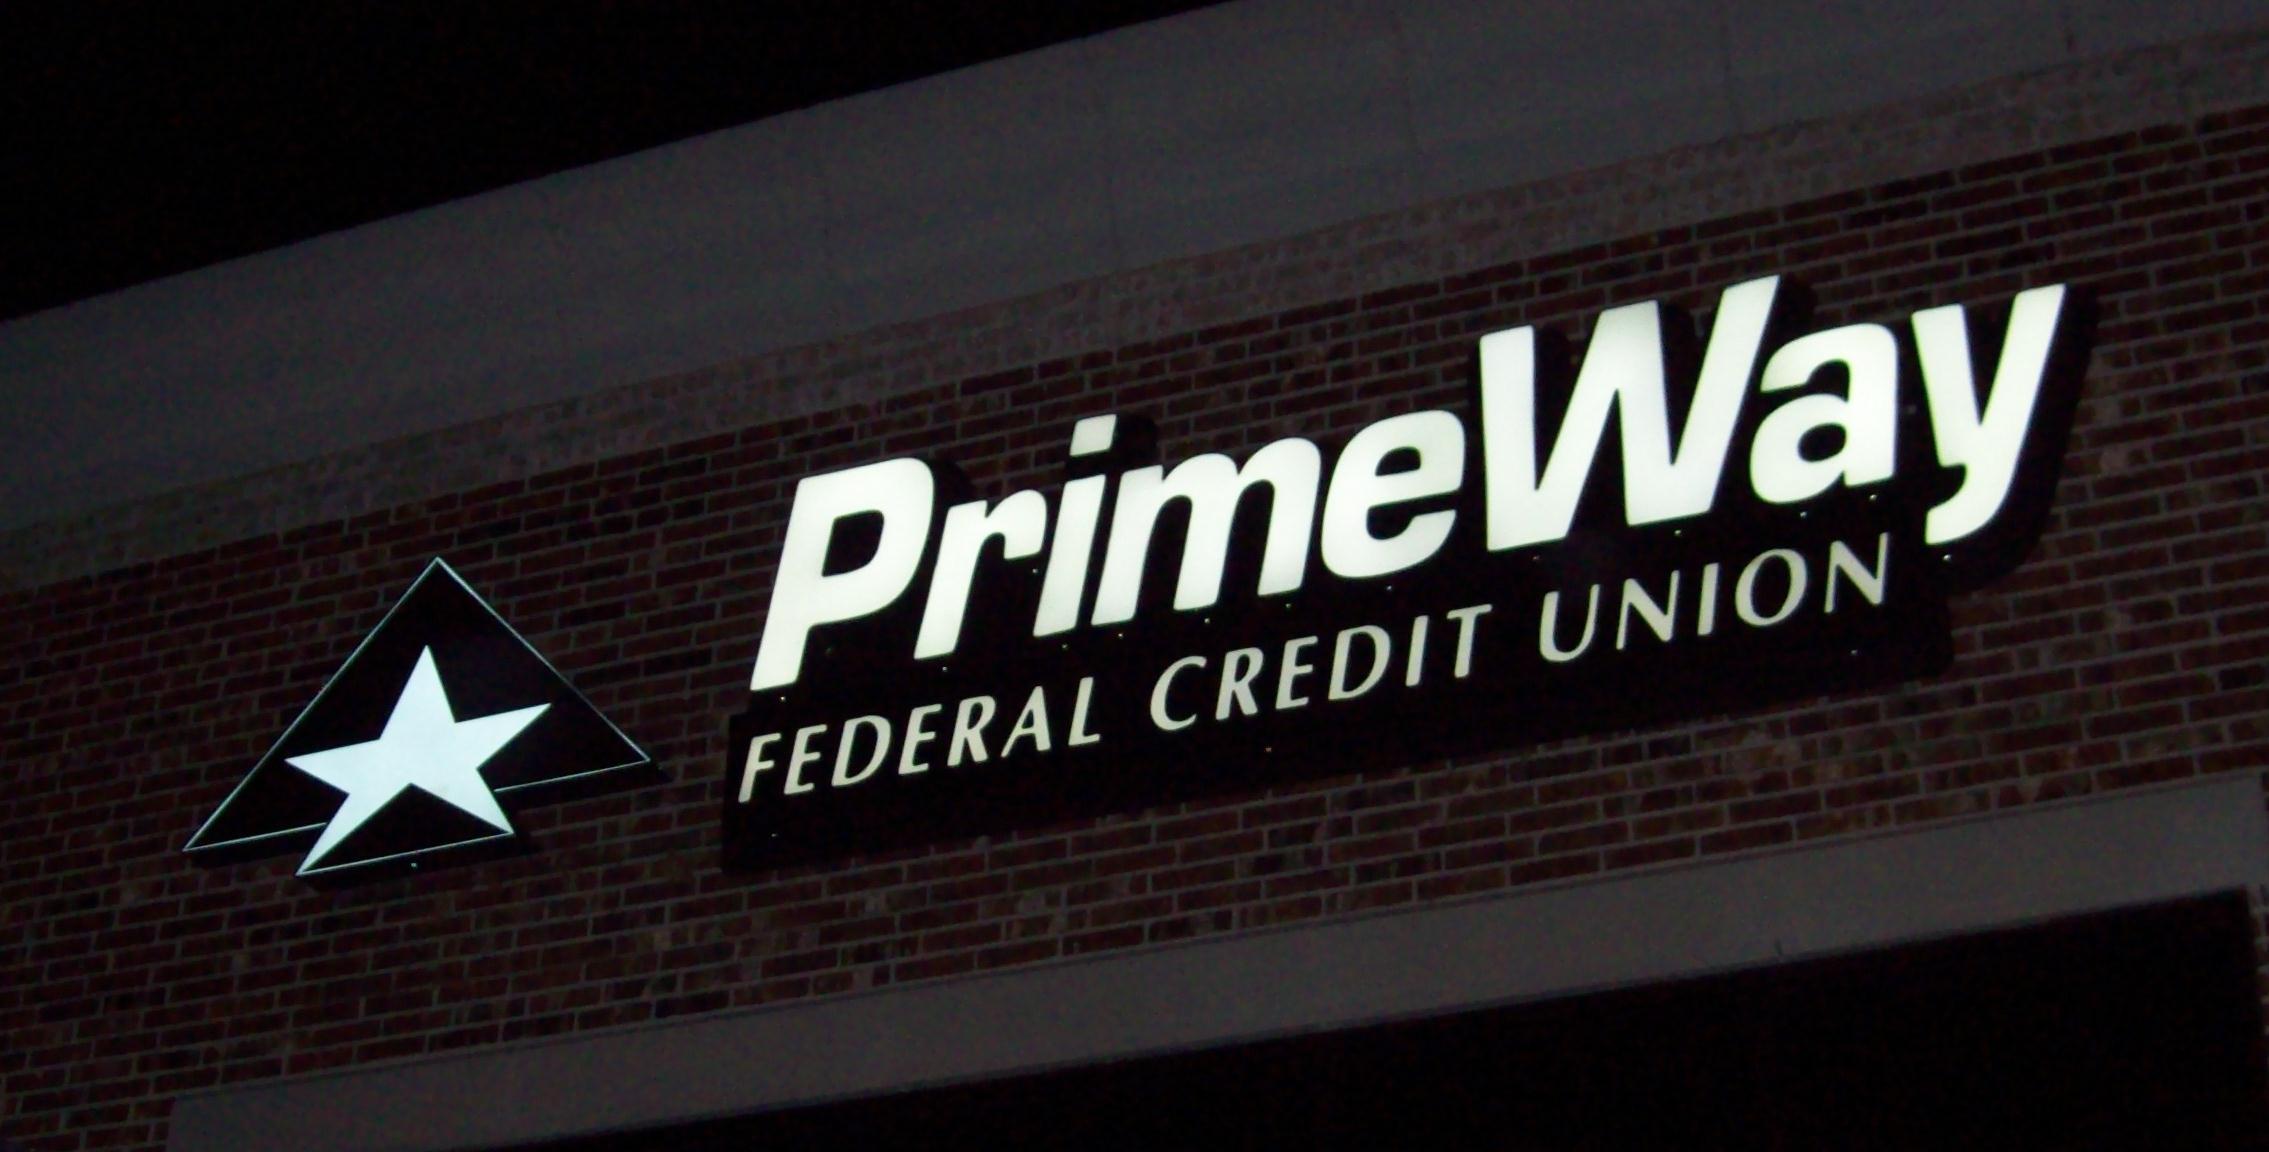 Primeway Credit Union